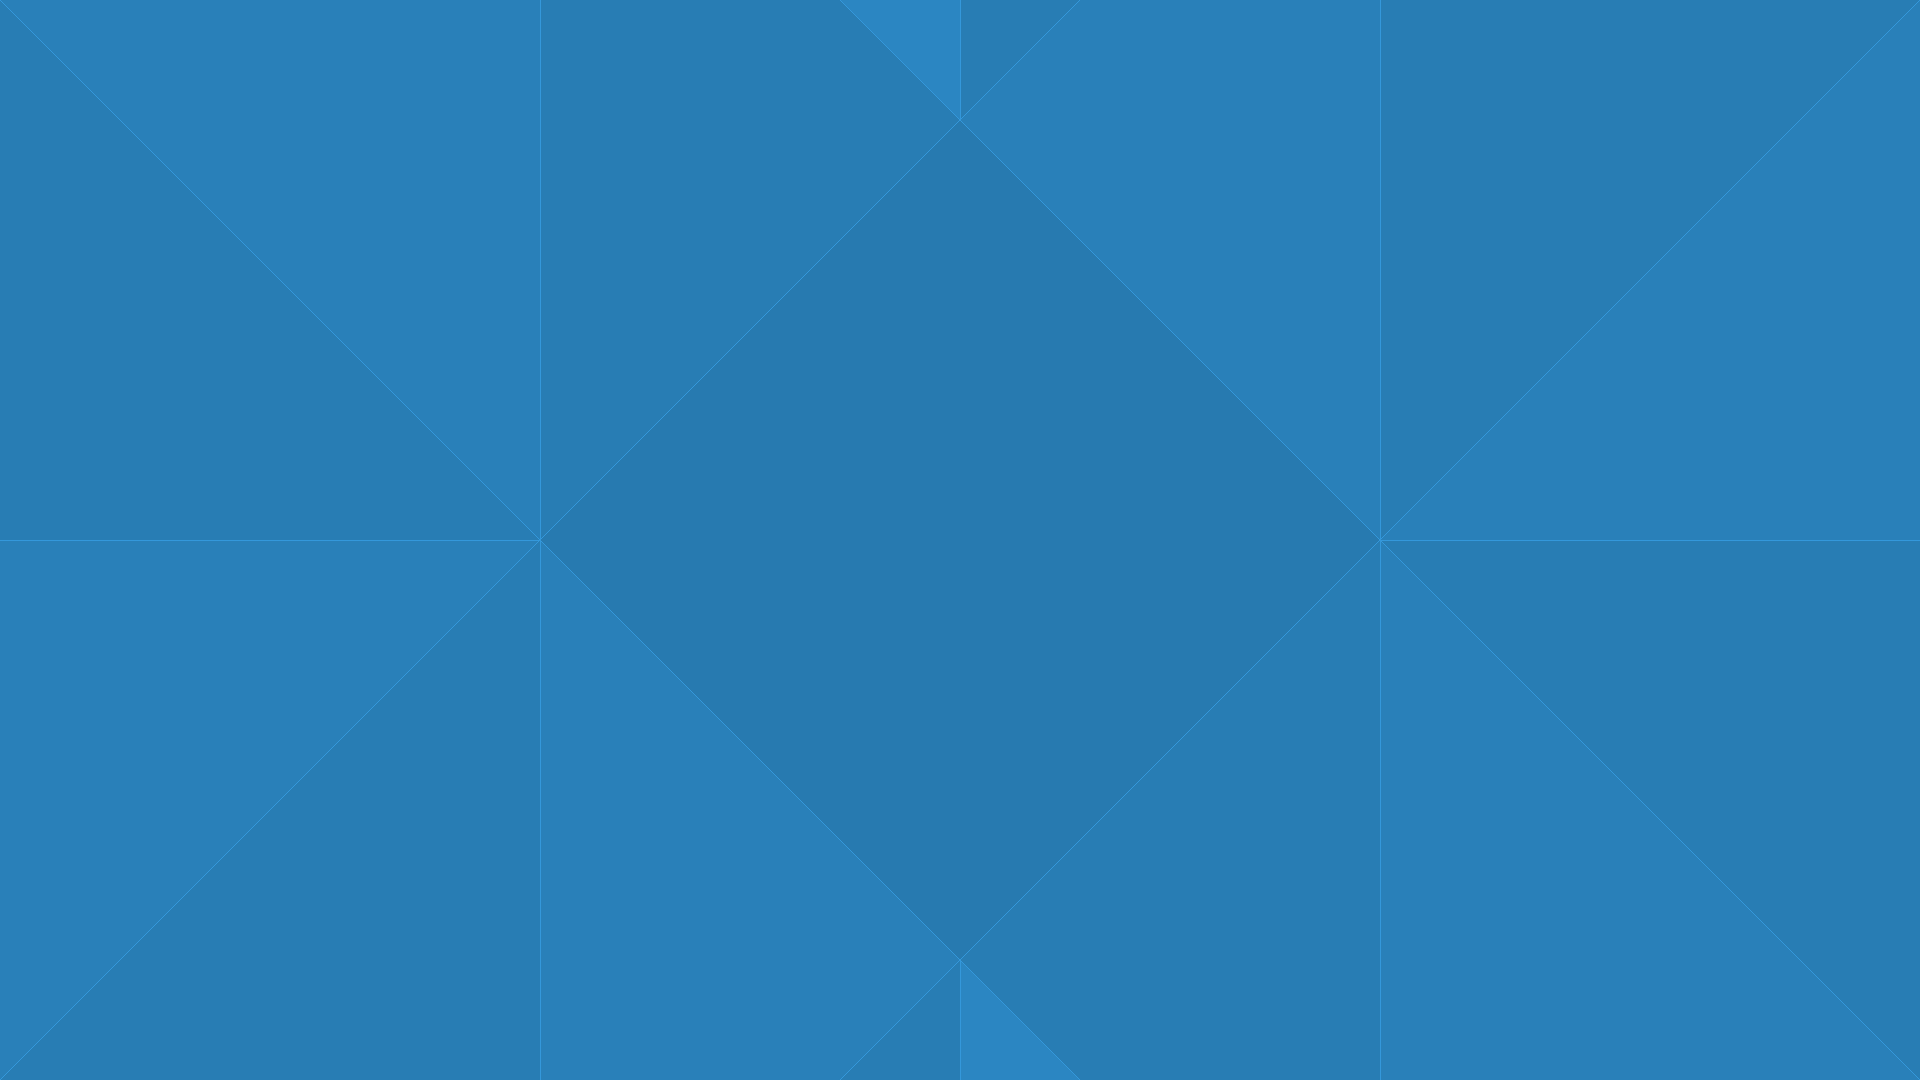 1080 png 27kB Blue Geometric Wallpaper 1 The Art Mad Wallpapers 1920x1080